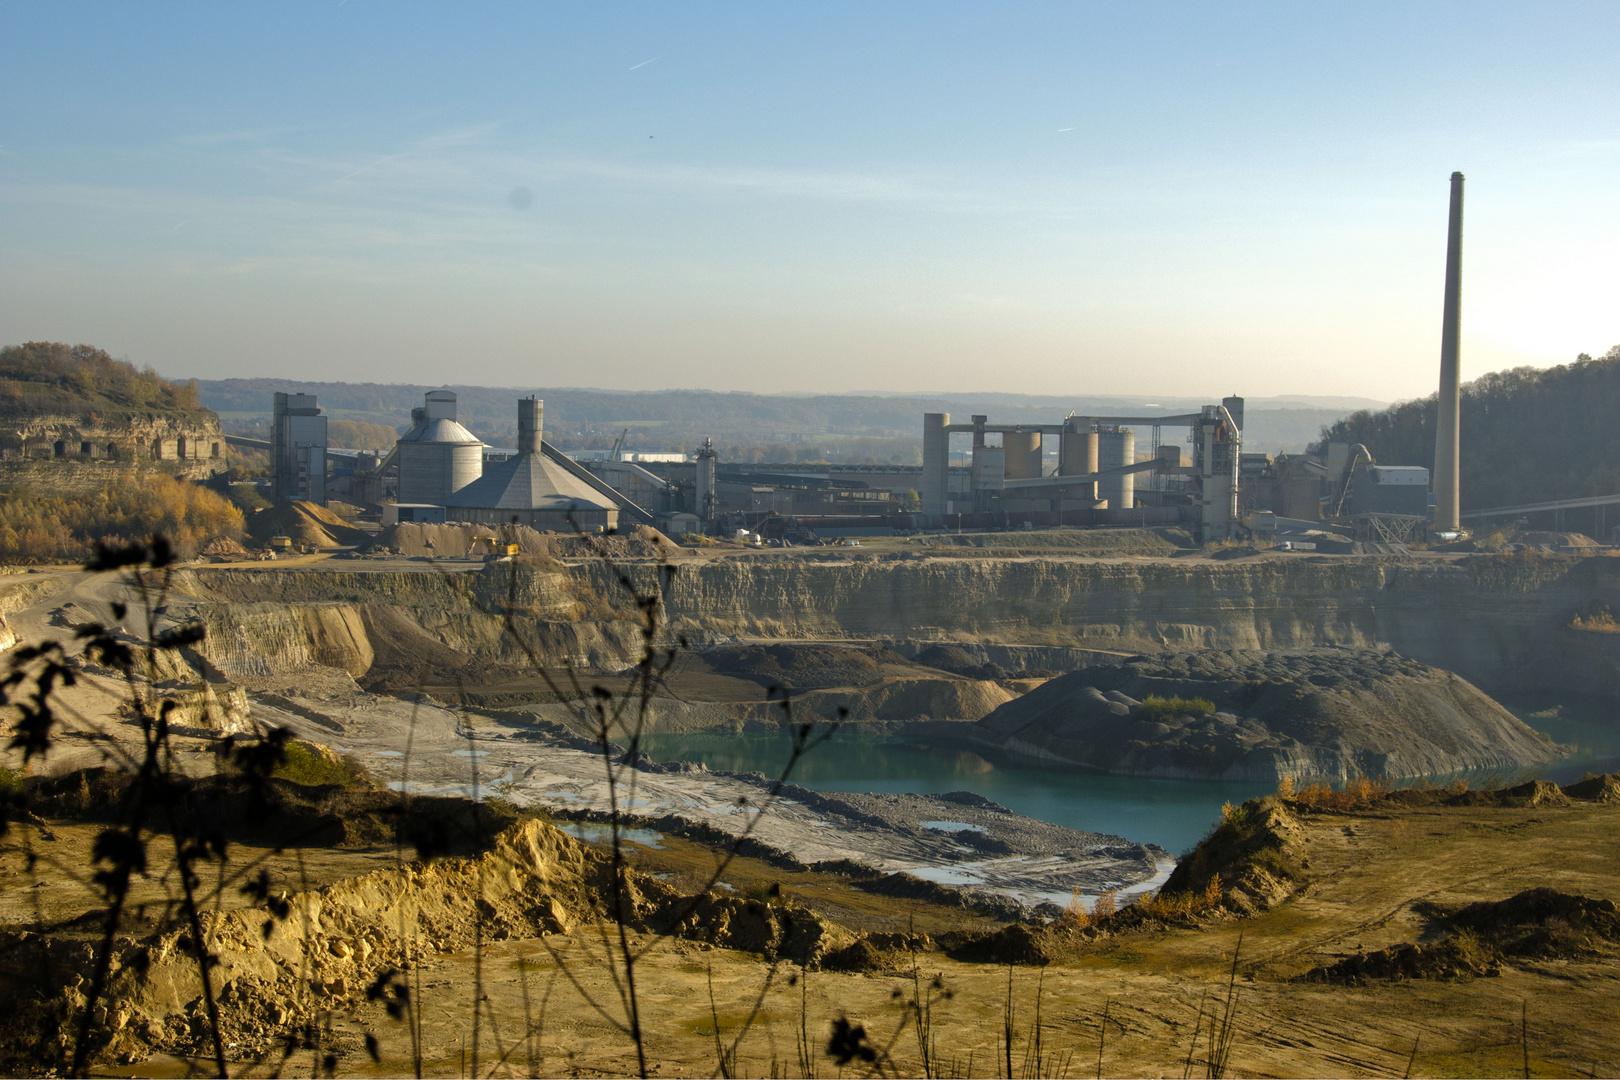 Maastricht - ENCI-Plant (Dutch Cement Works) - 04